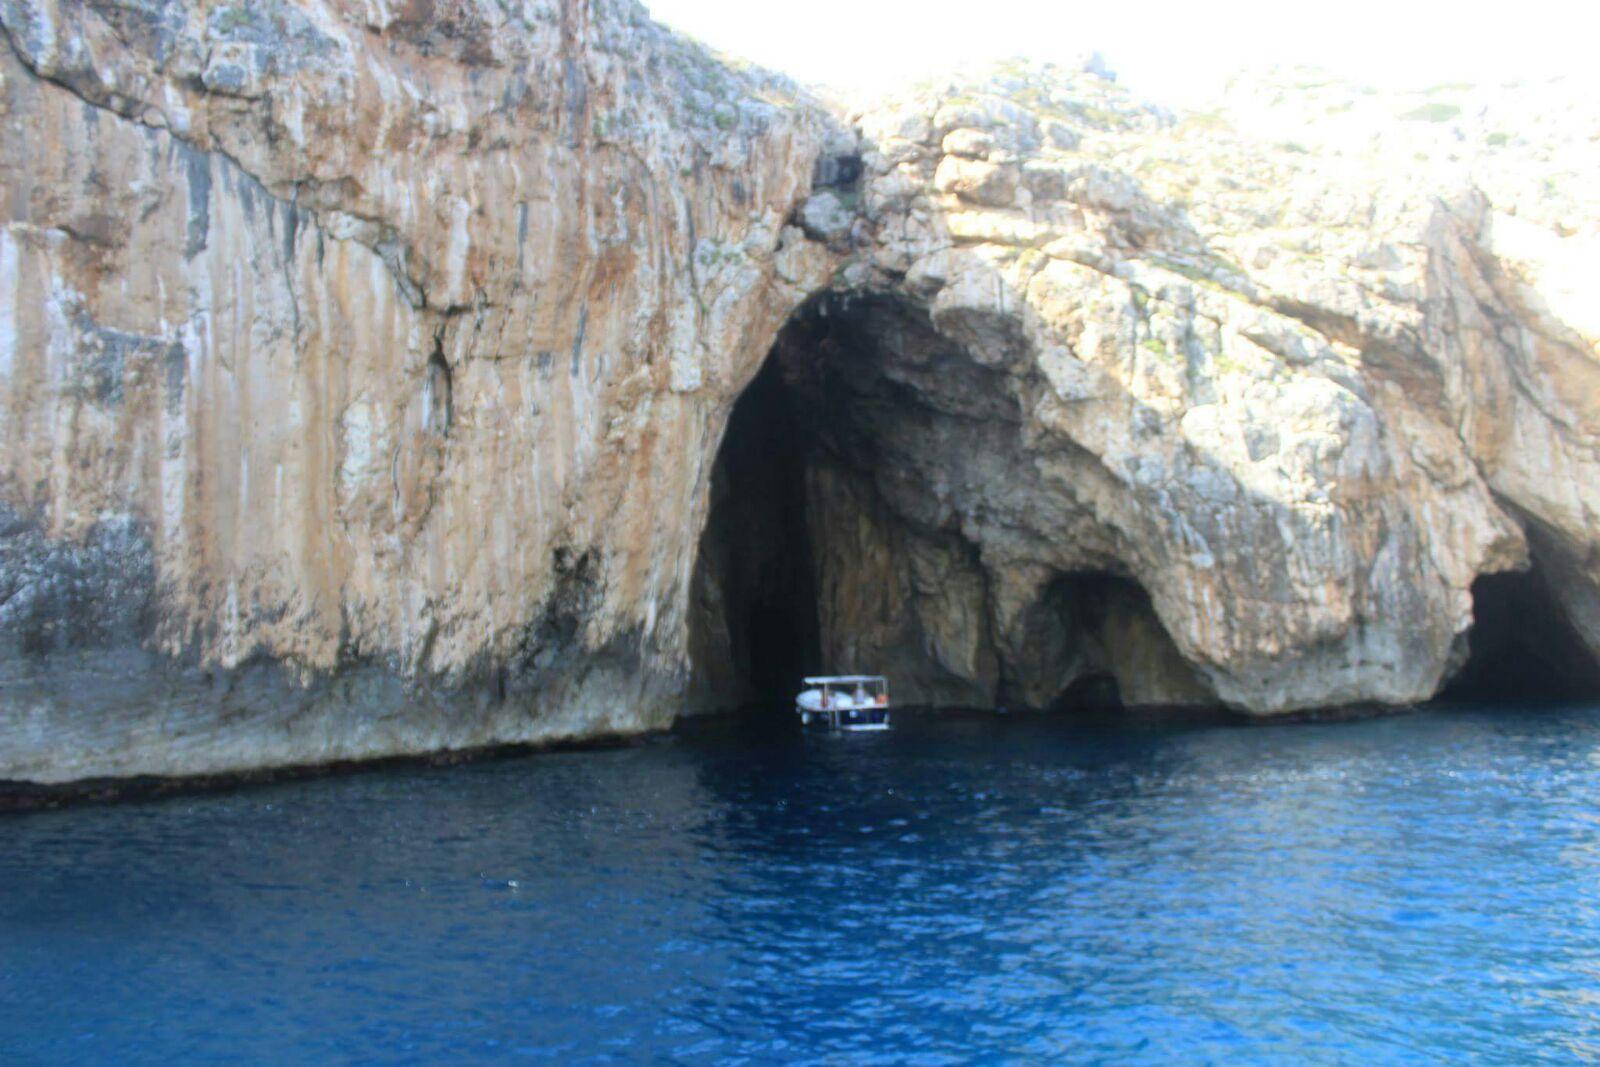 grotte marine, salento (matilda qose)